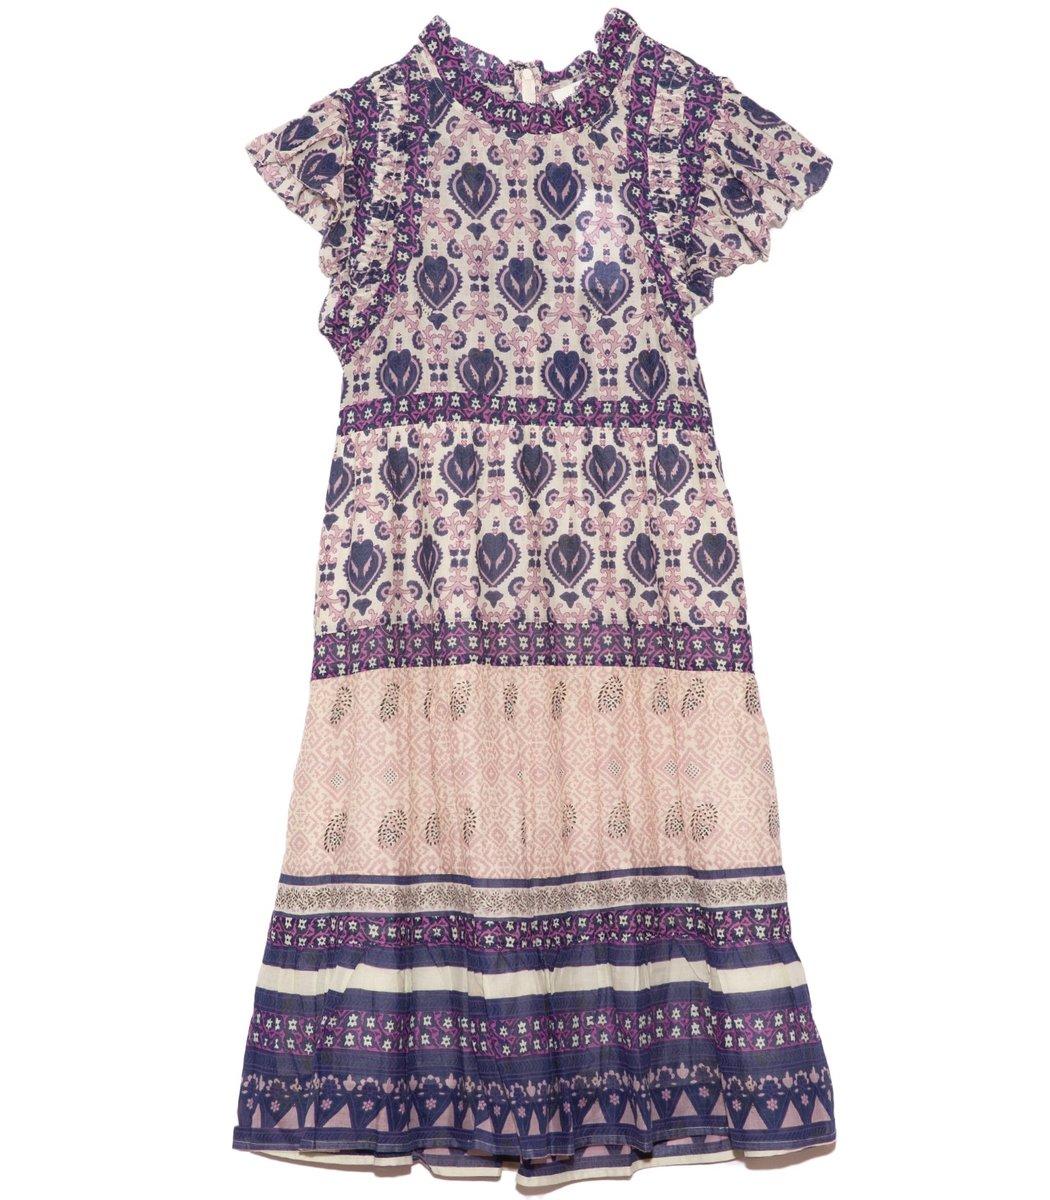 Sea Brigitte Border Mini Dress in Violet